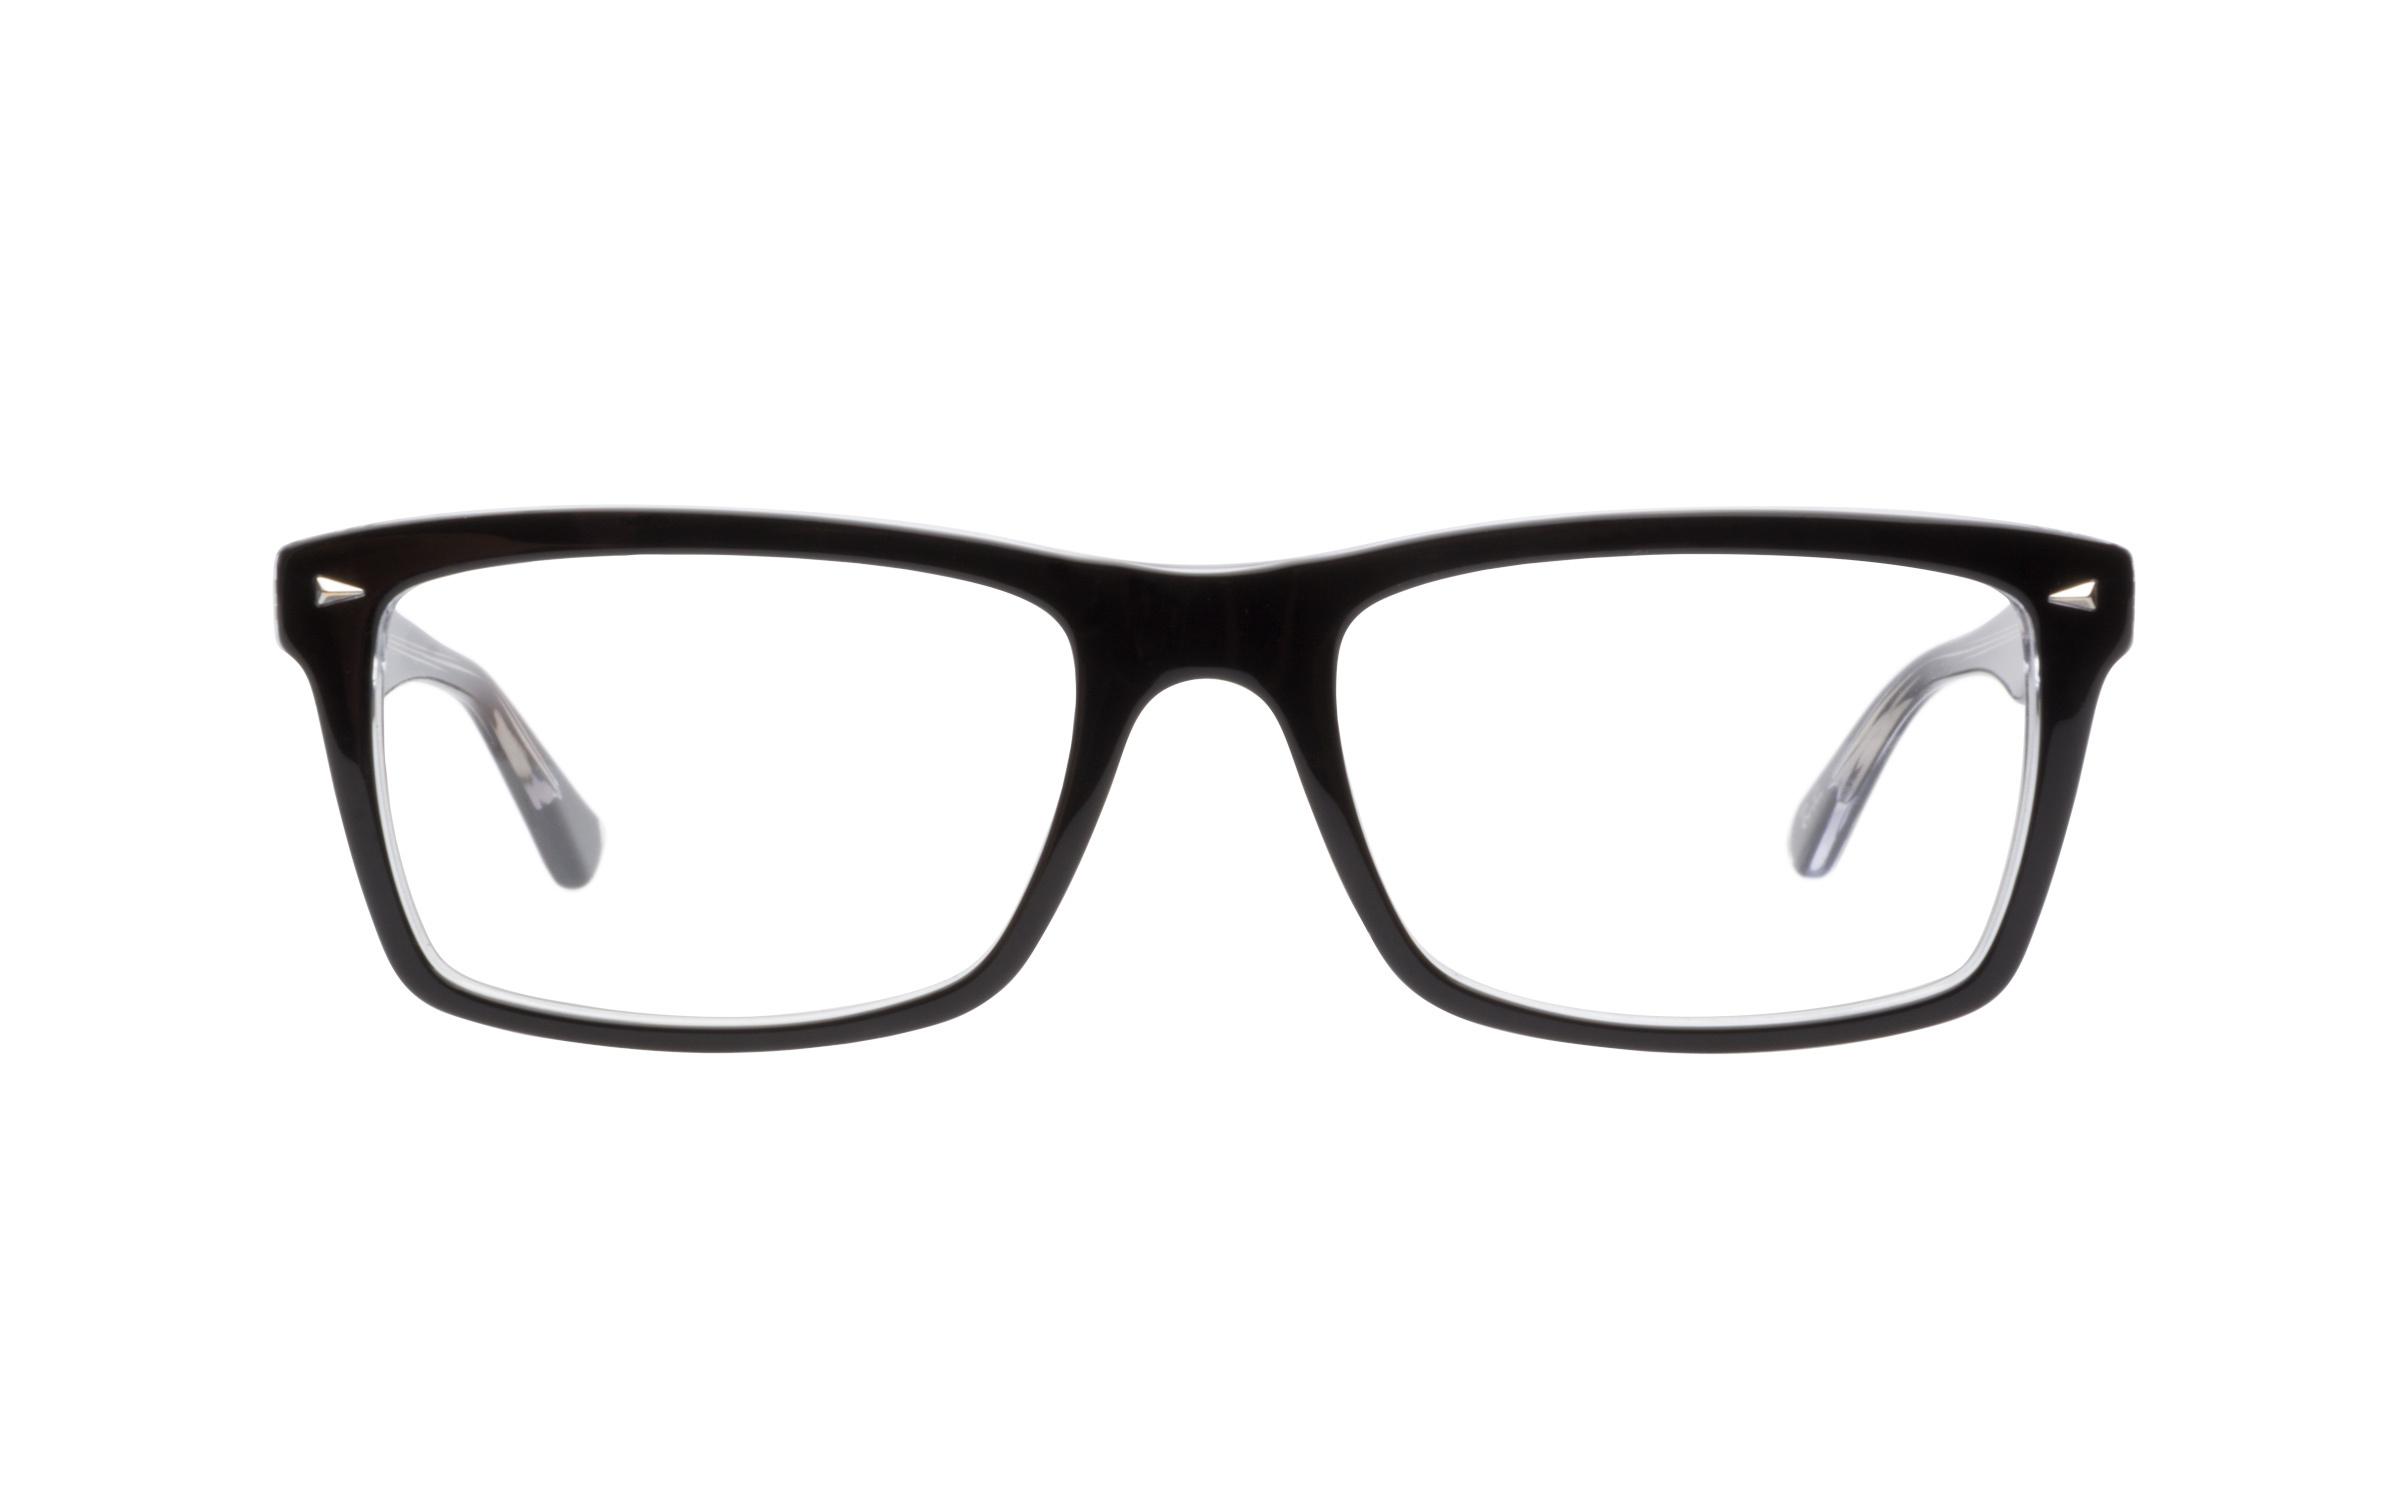 http://www.coastal.com/ - Luxottica Ray-Ban RB5287 2034 Eyeglasses and Frame in Transparent Black | Acetate – Online Coastal